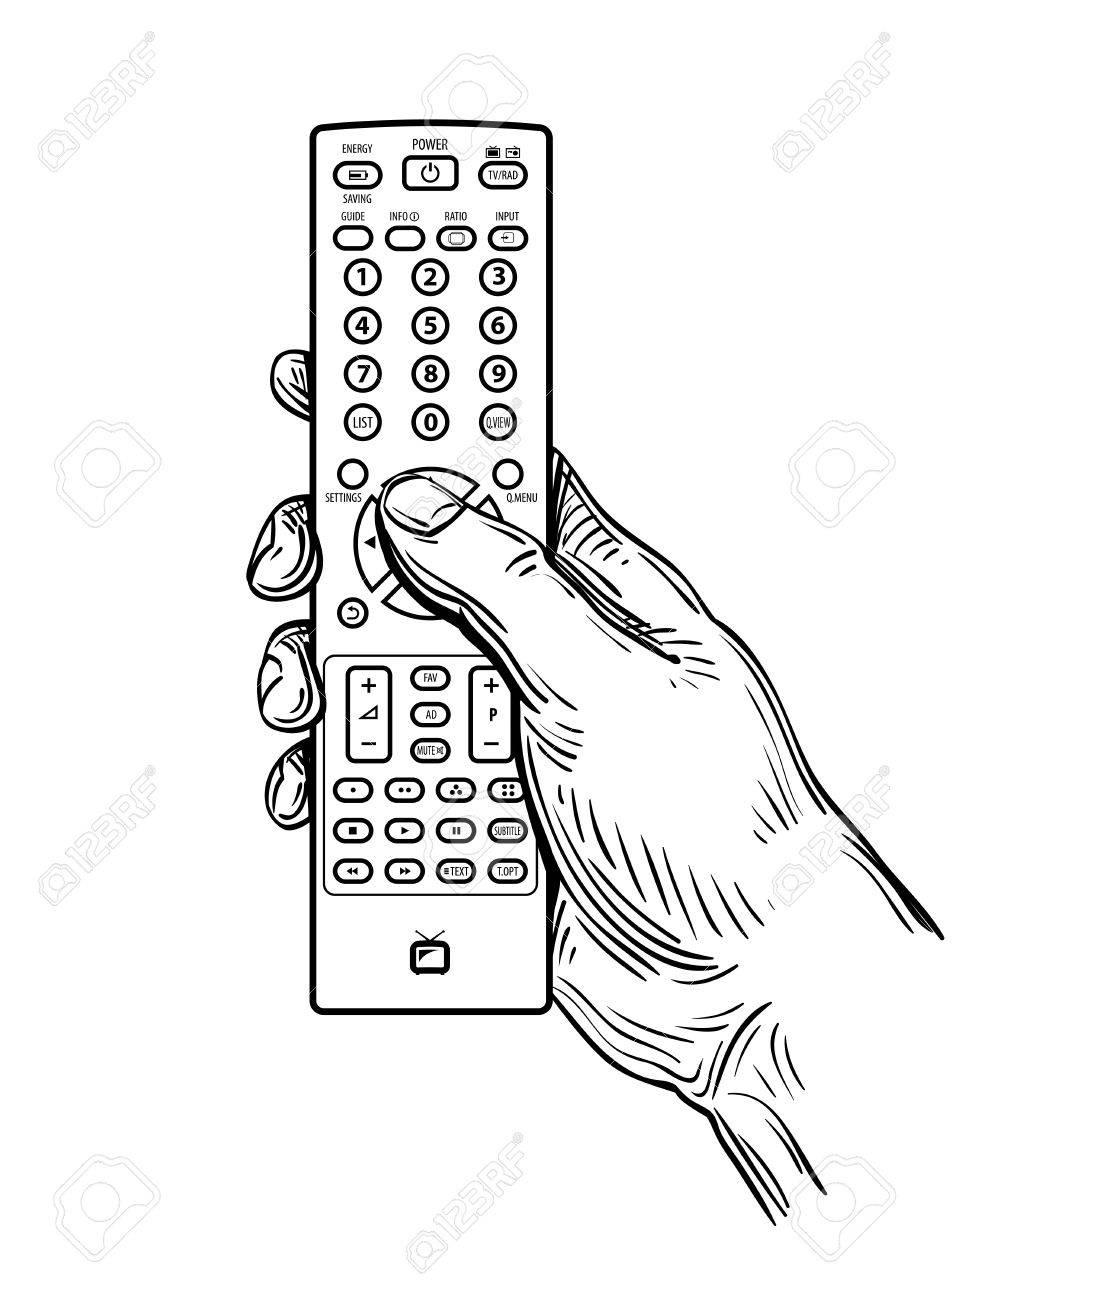 remote control drawing at getdrawings com